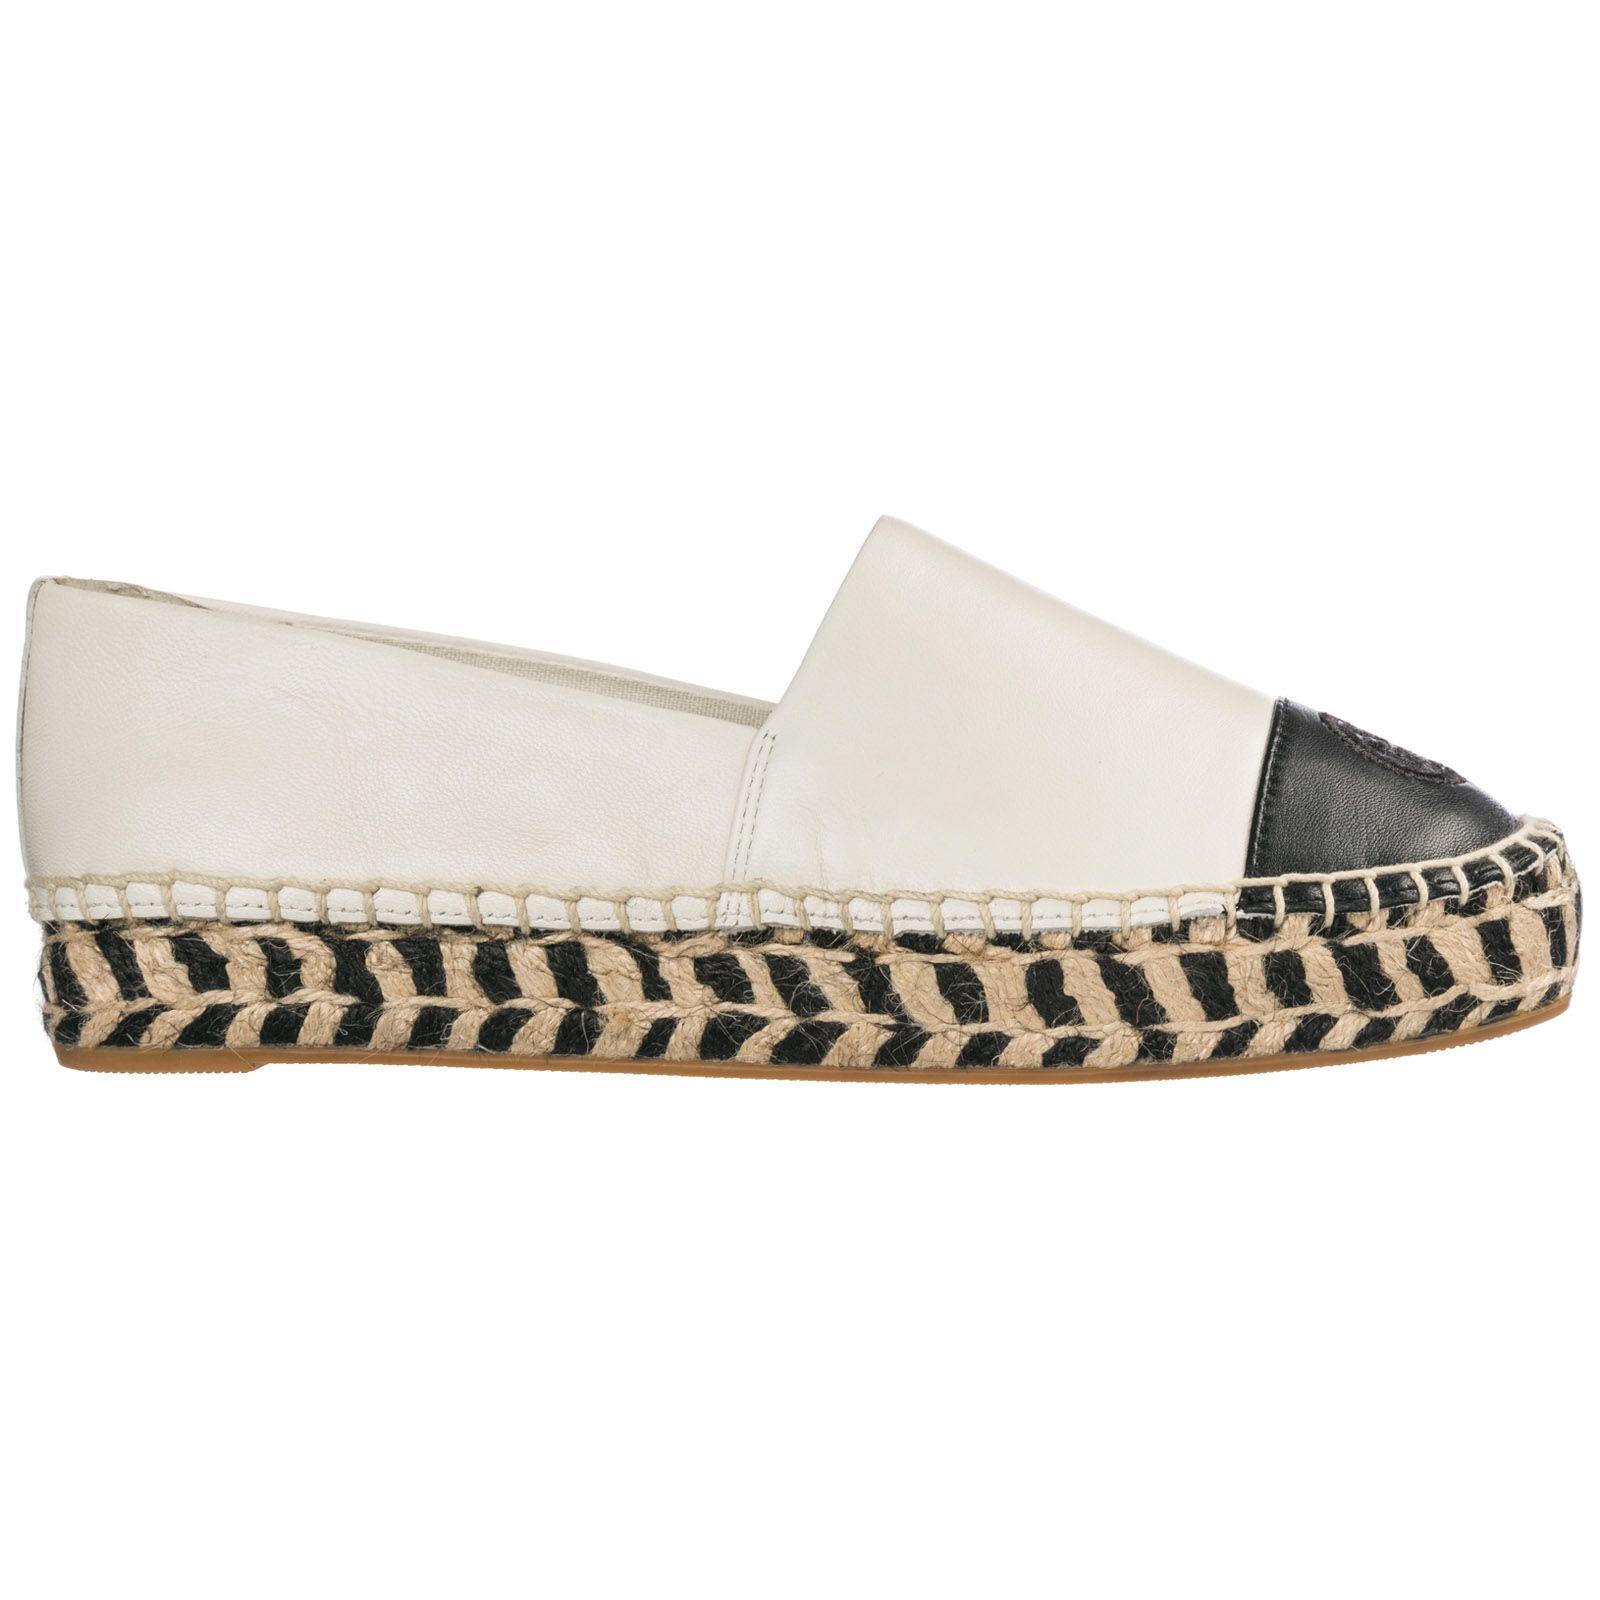 Tory Burch Espadrilles Slip On Shoes